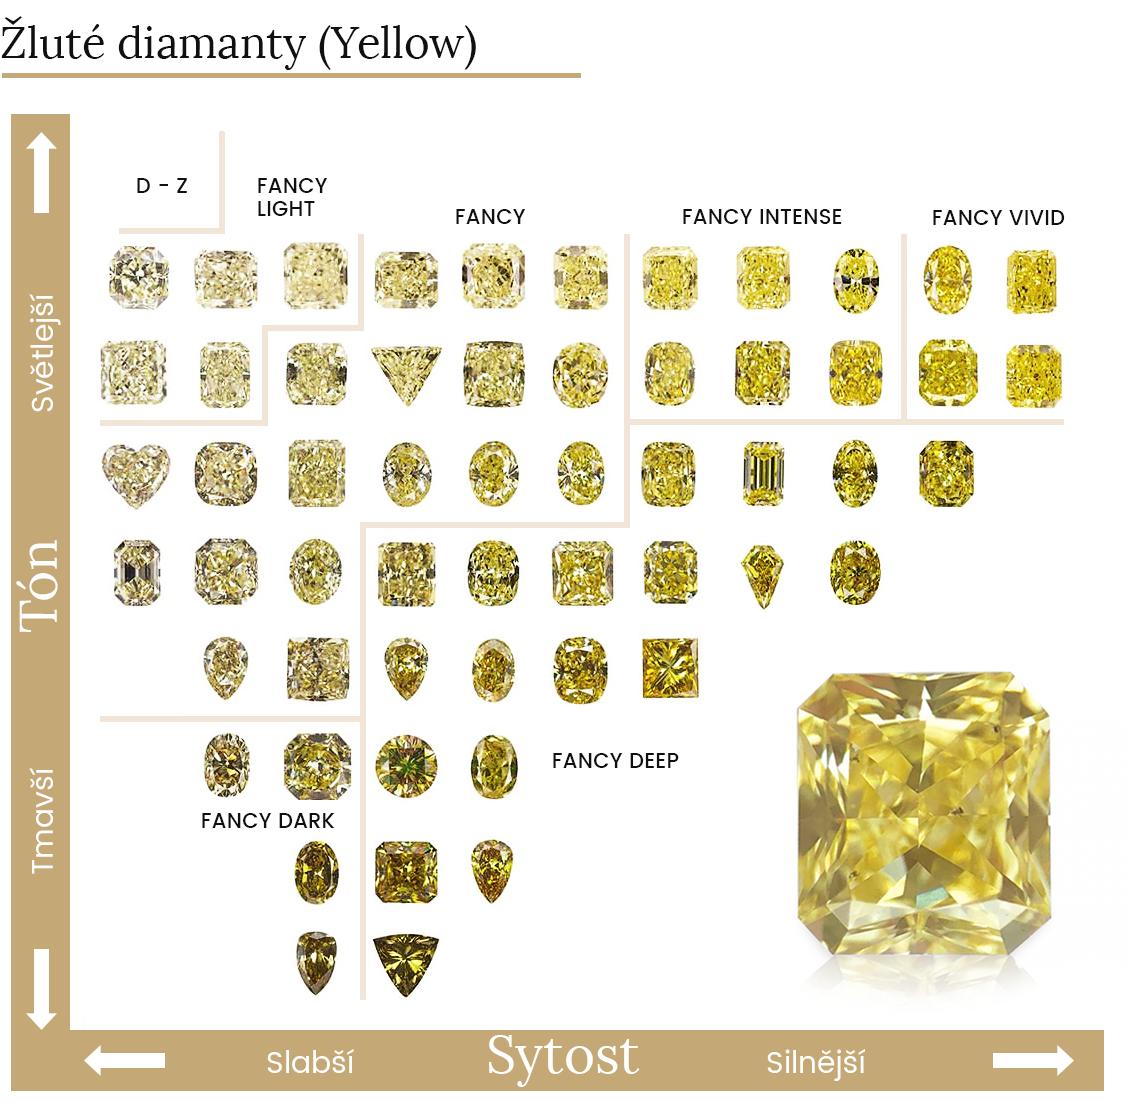 žluté diamanty